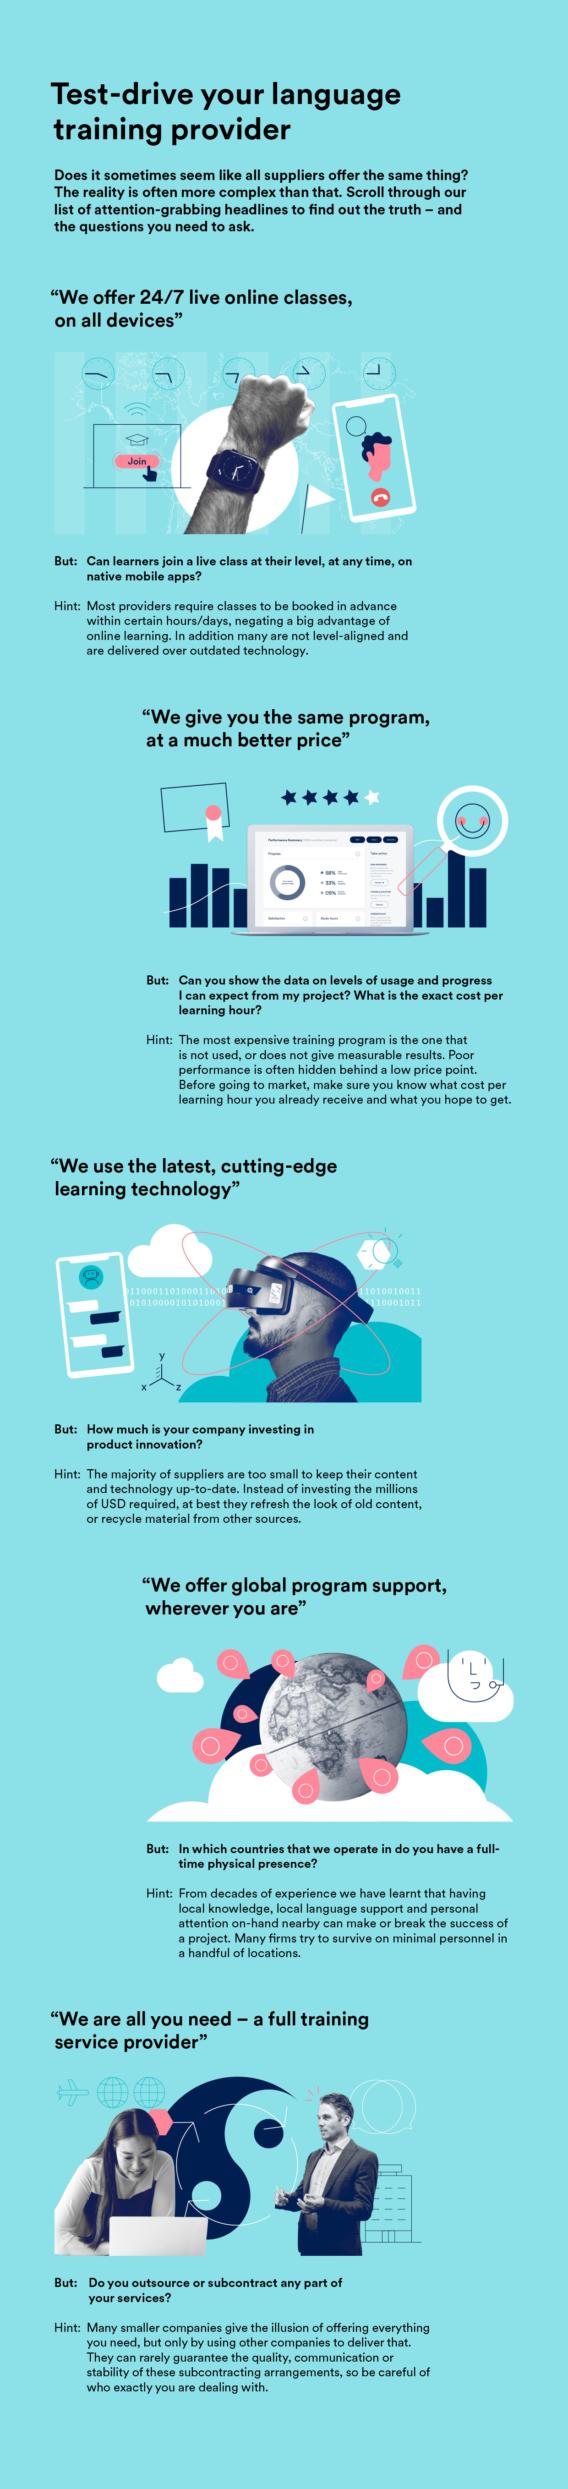 Infographic-language-training